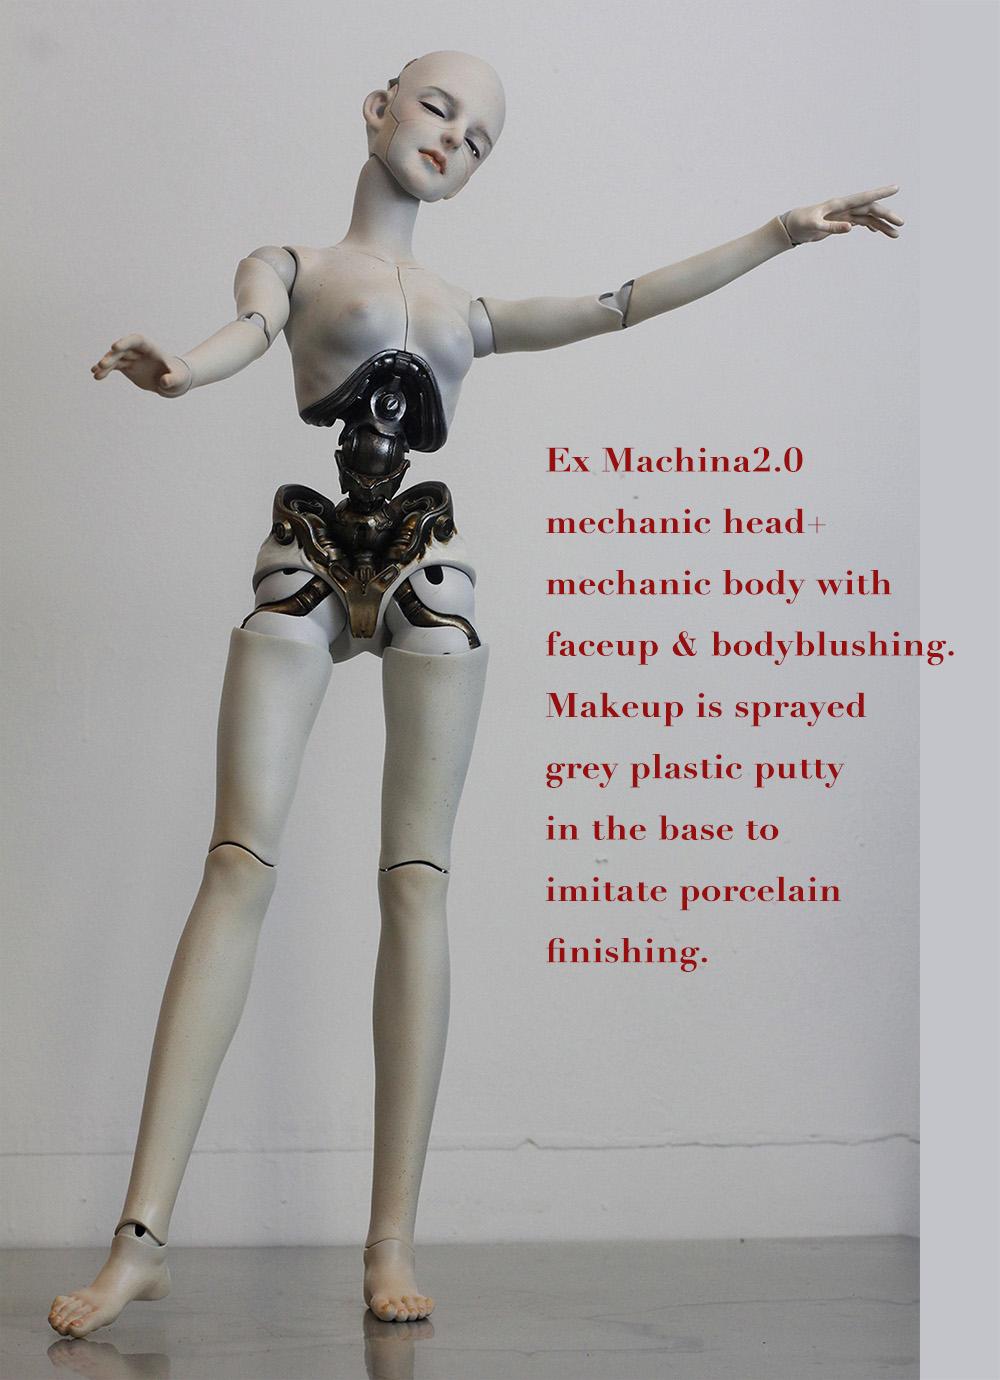 2.0 mechanic head+mechanic body